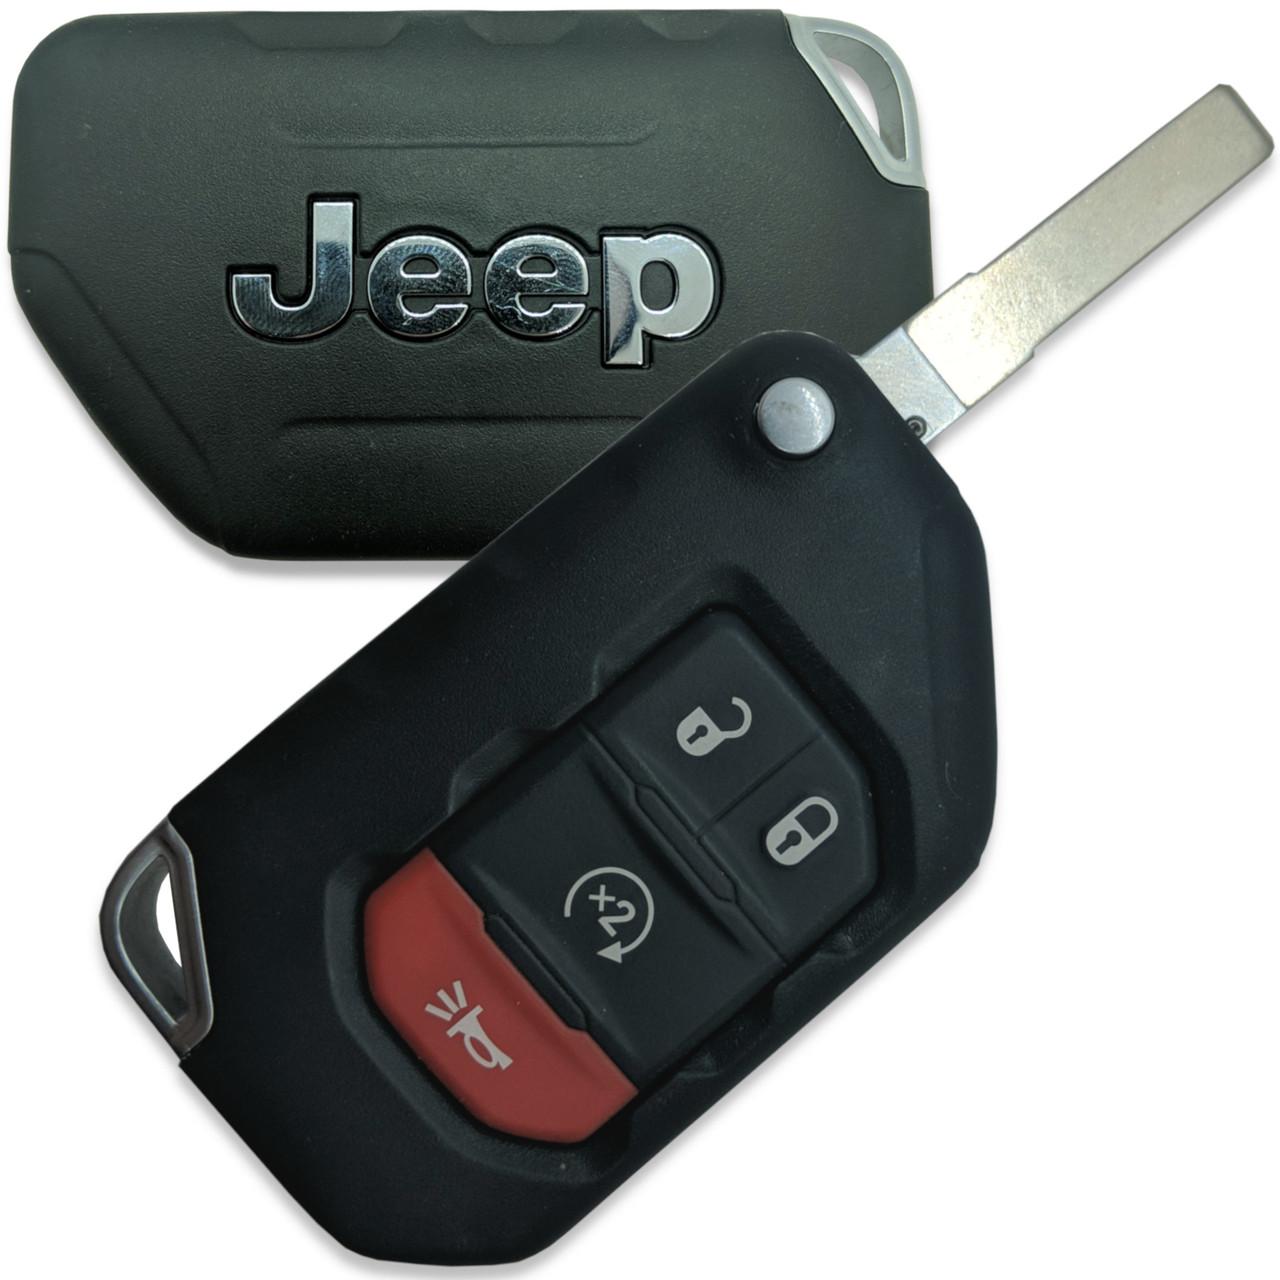 Jeep Wrangler , Gladiator , Wrangler JK 68292944AA , OHT1130261 OHT1130261 6461A-1130261 Key - Prox Smart